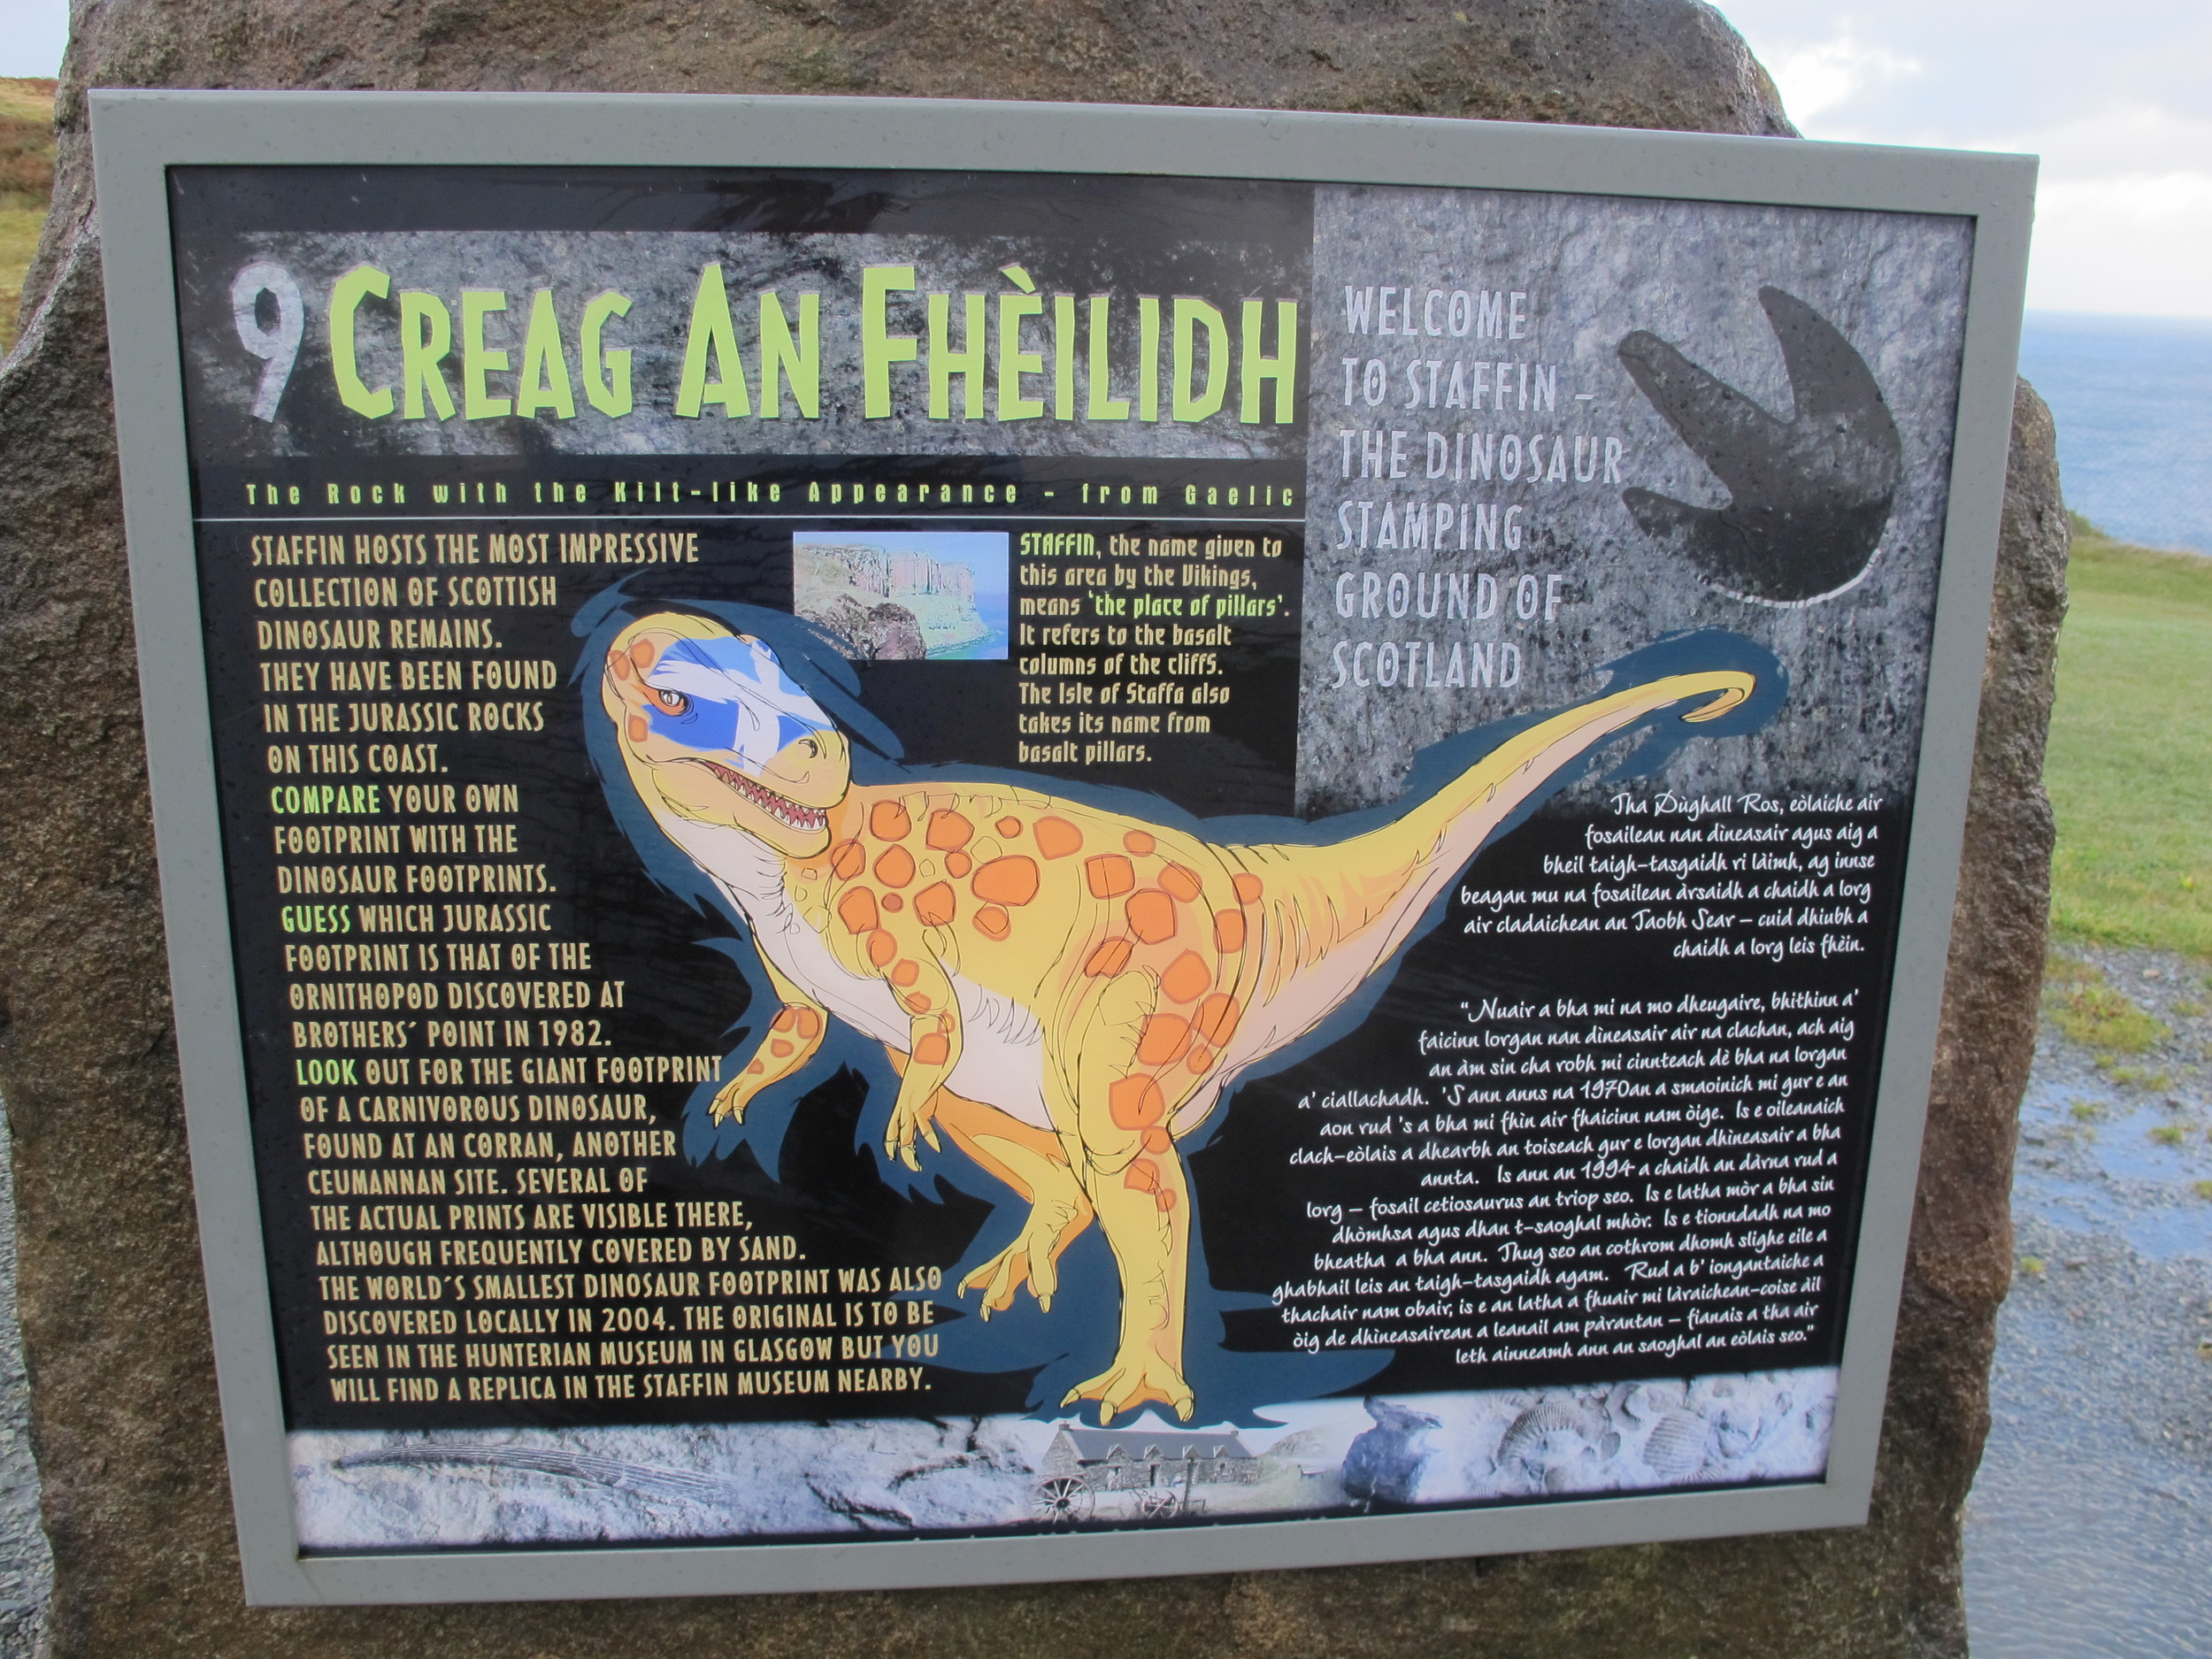 We walked in the footsteps of giants; Skye was once prime dinosaur territory.